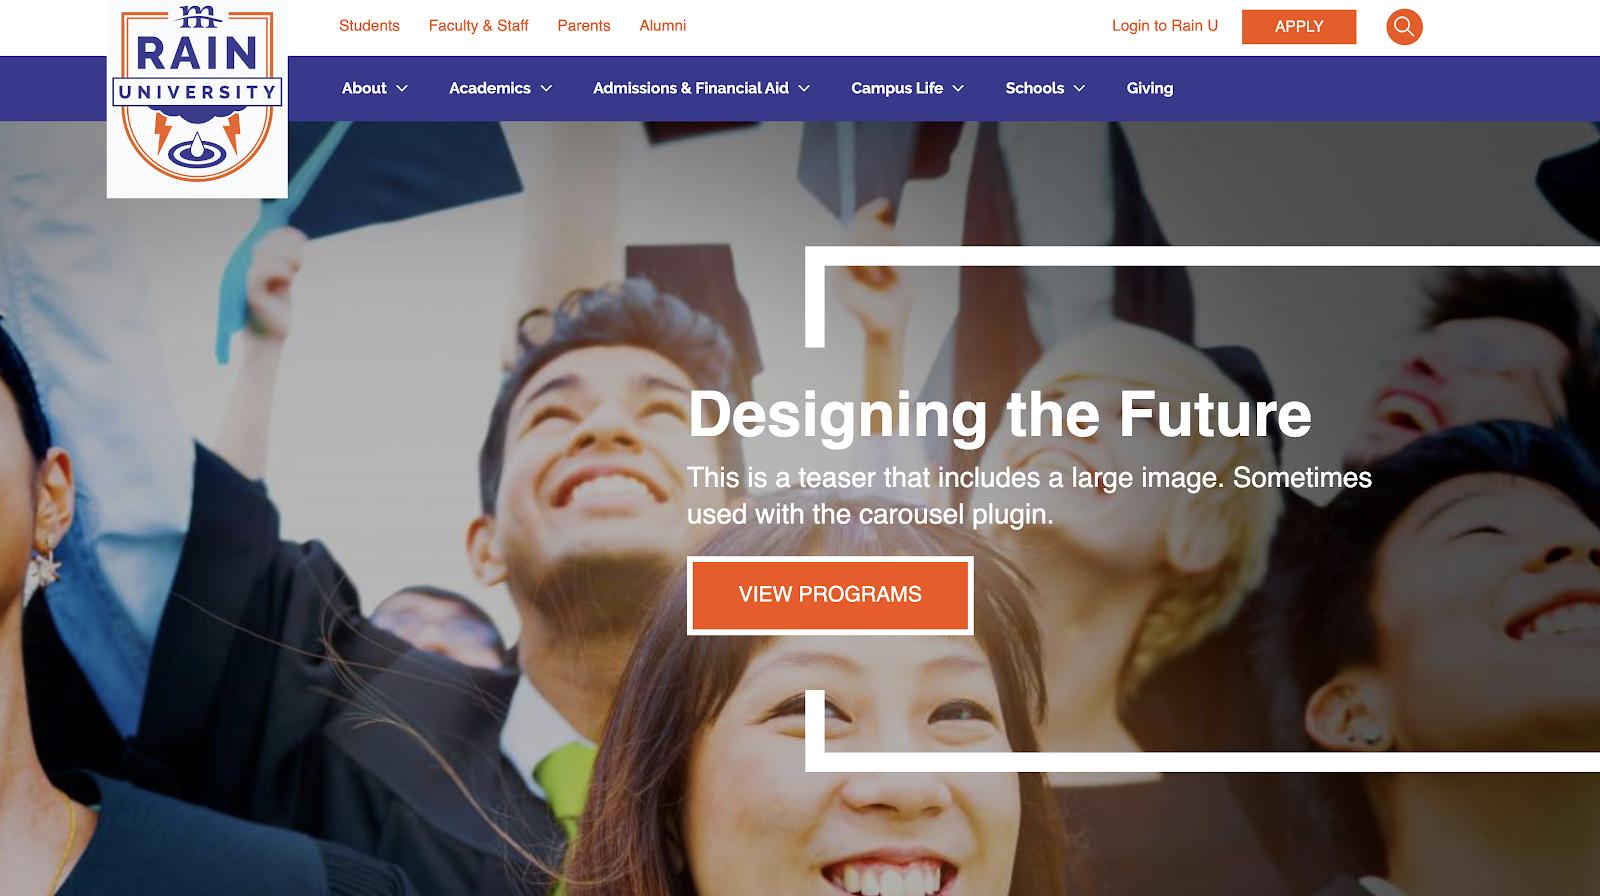 RainU CMS for Drupal homepage